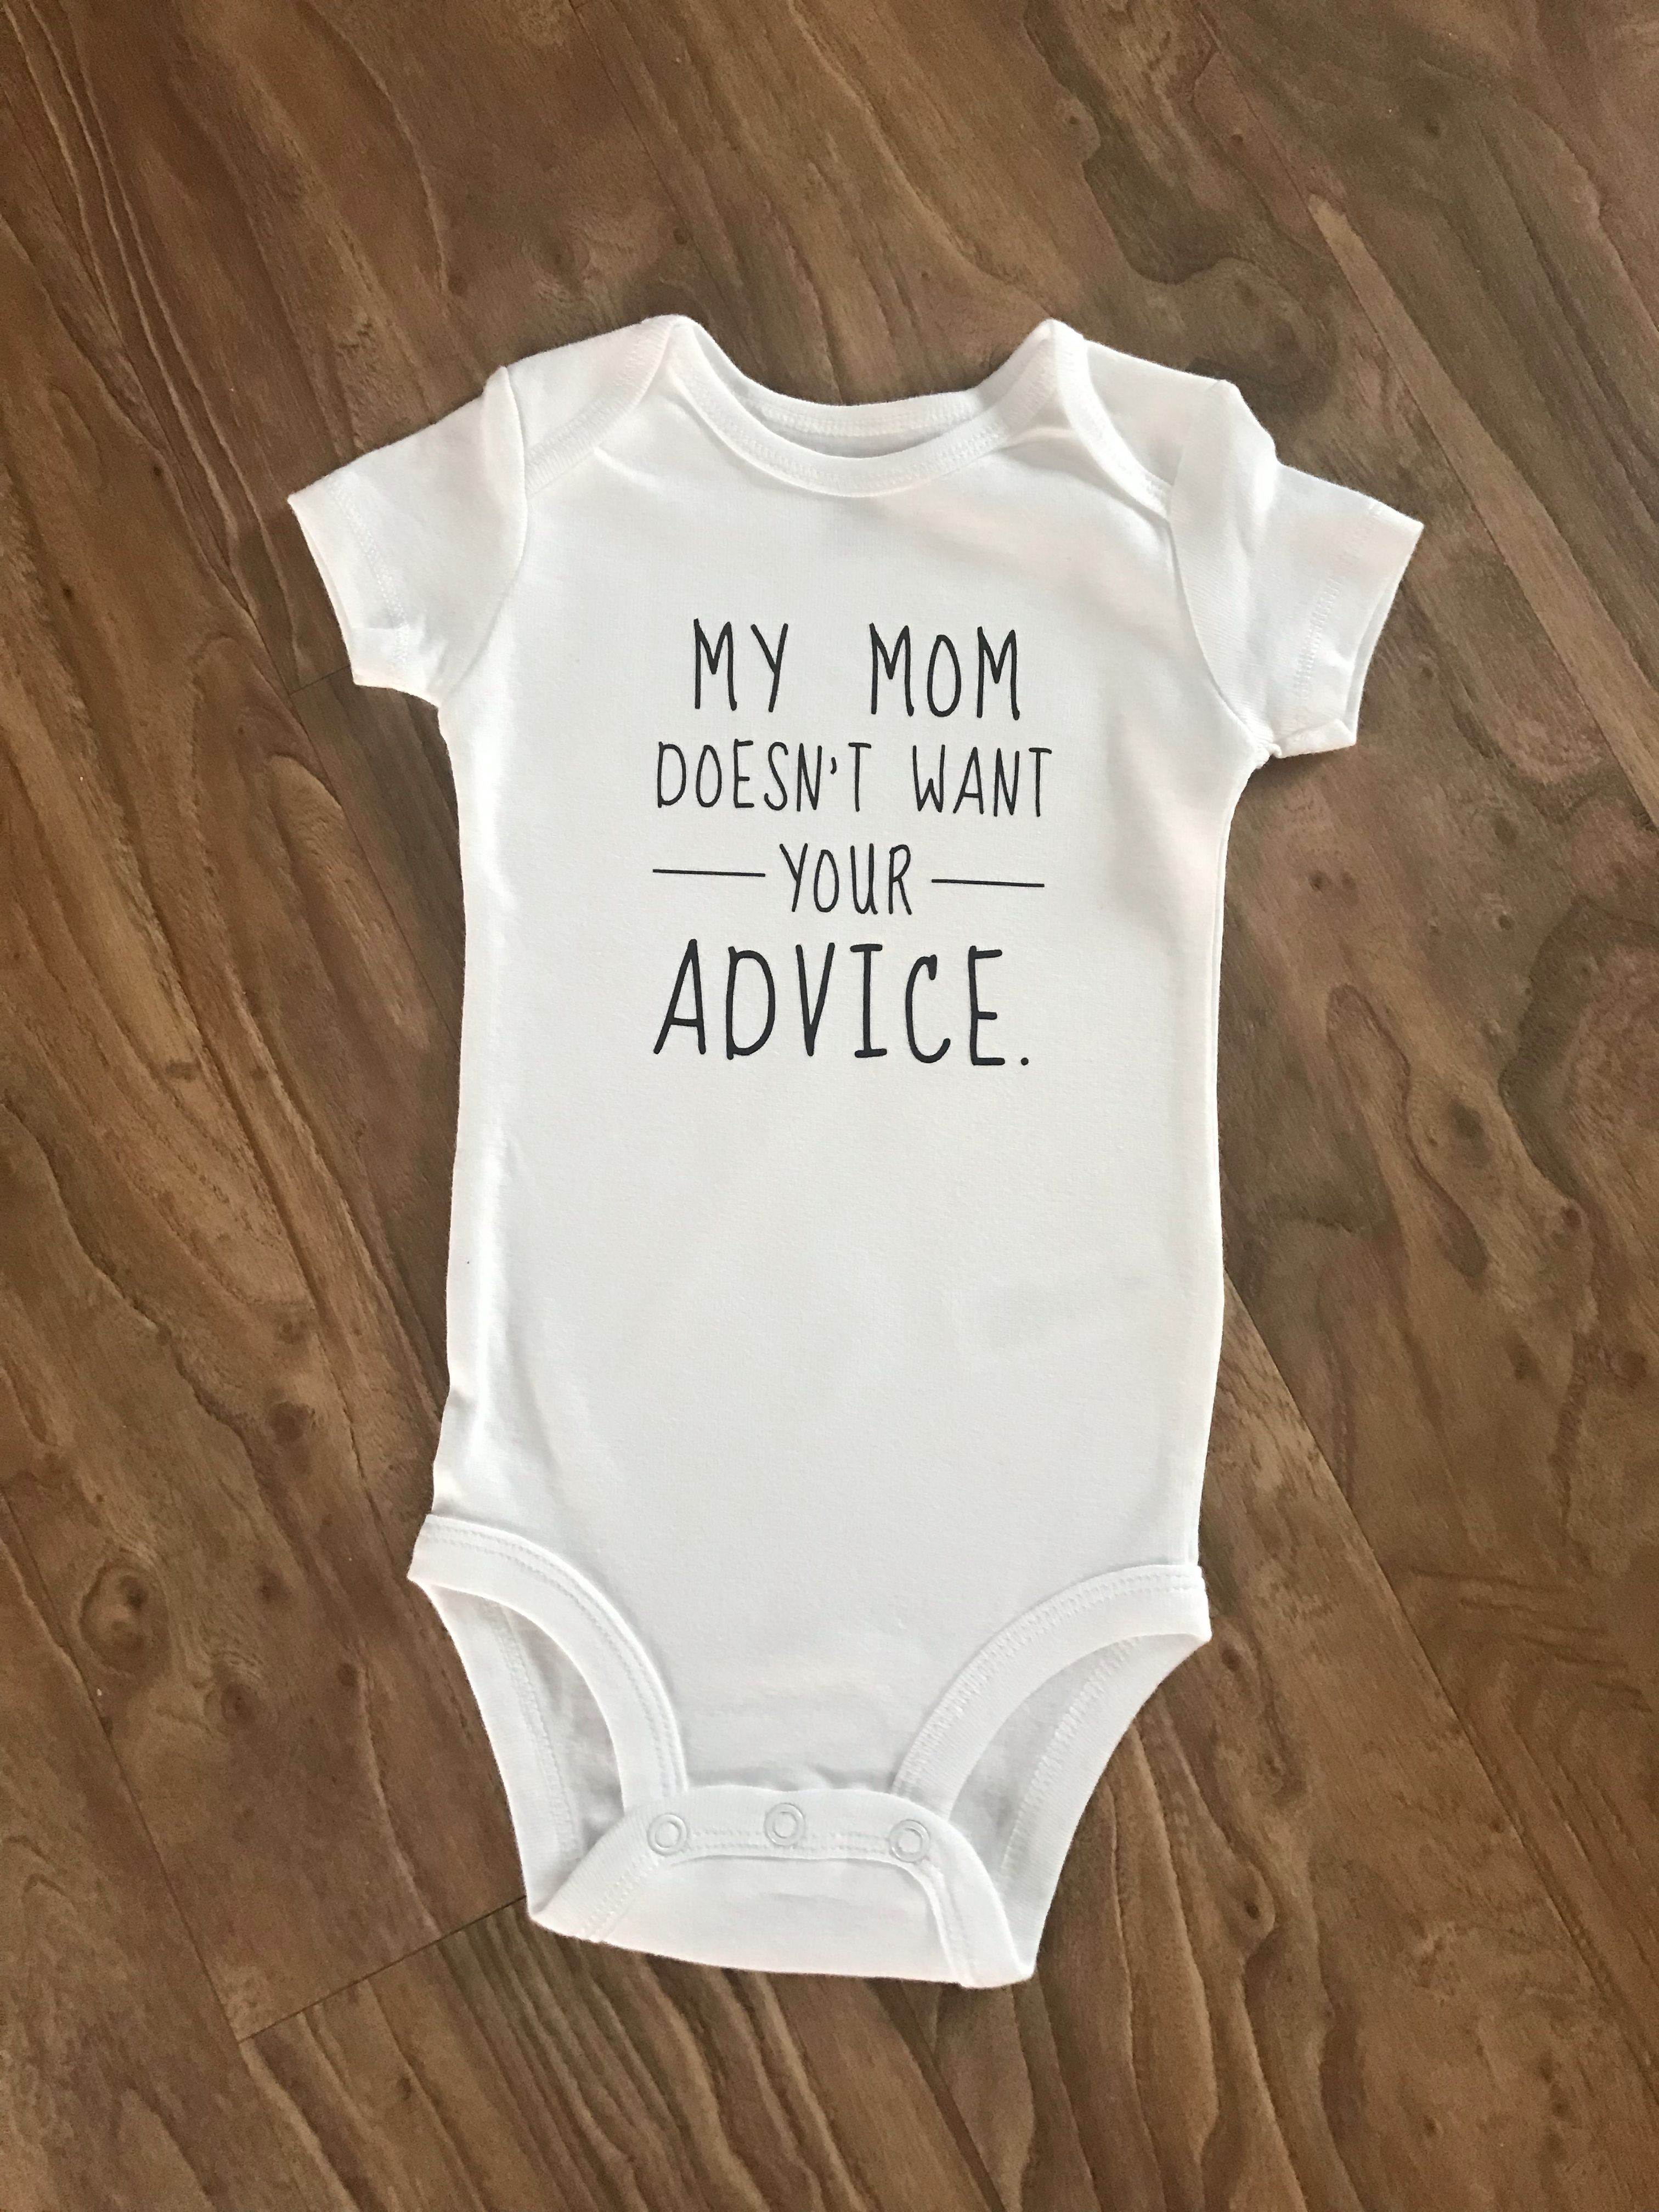 33++ Baby onesie cricut ideas ideas in 2021